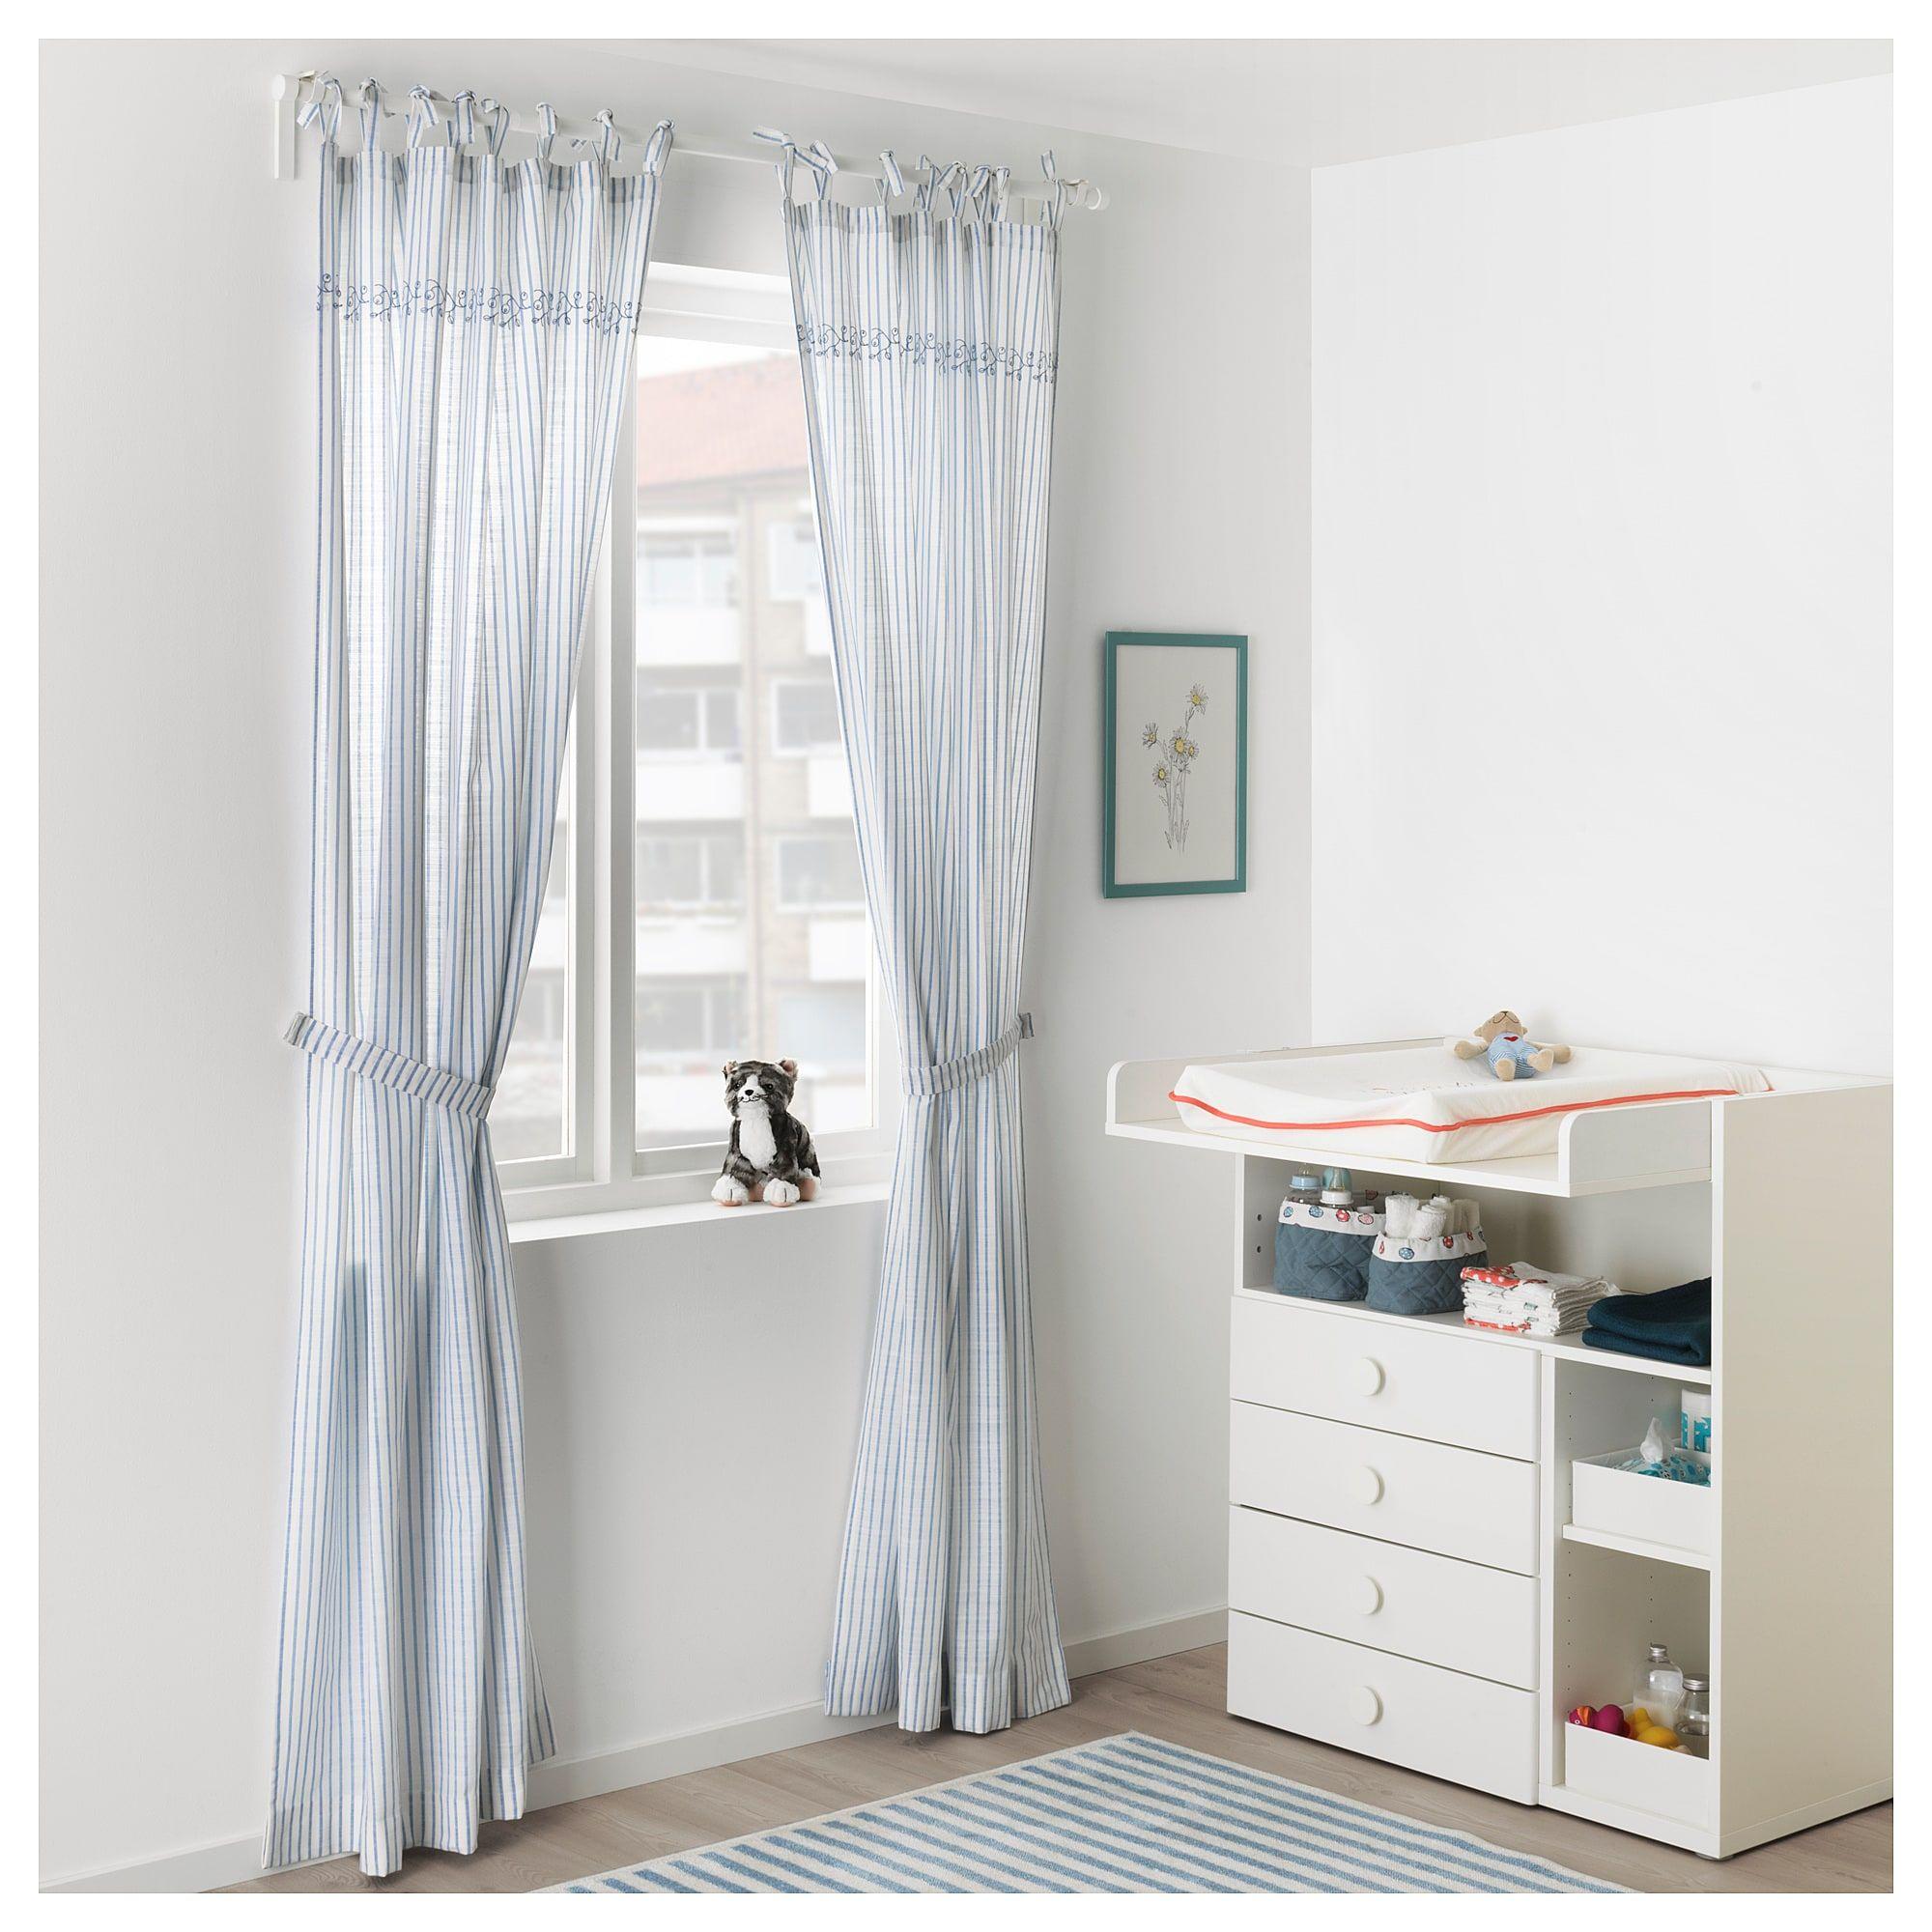 IKEA GULSPARV Curtains With Tie Backs 1